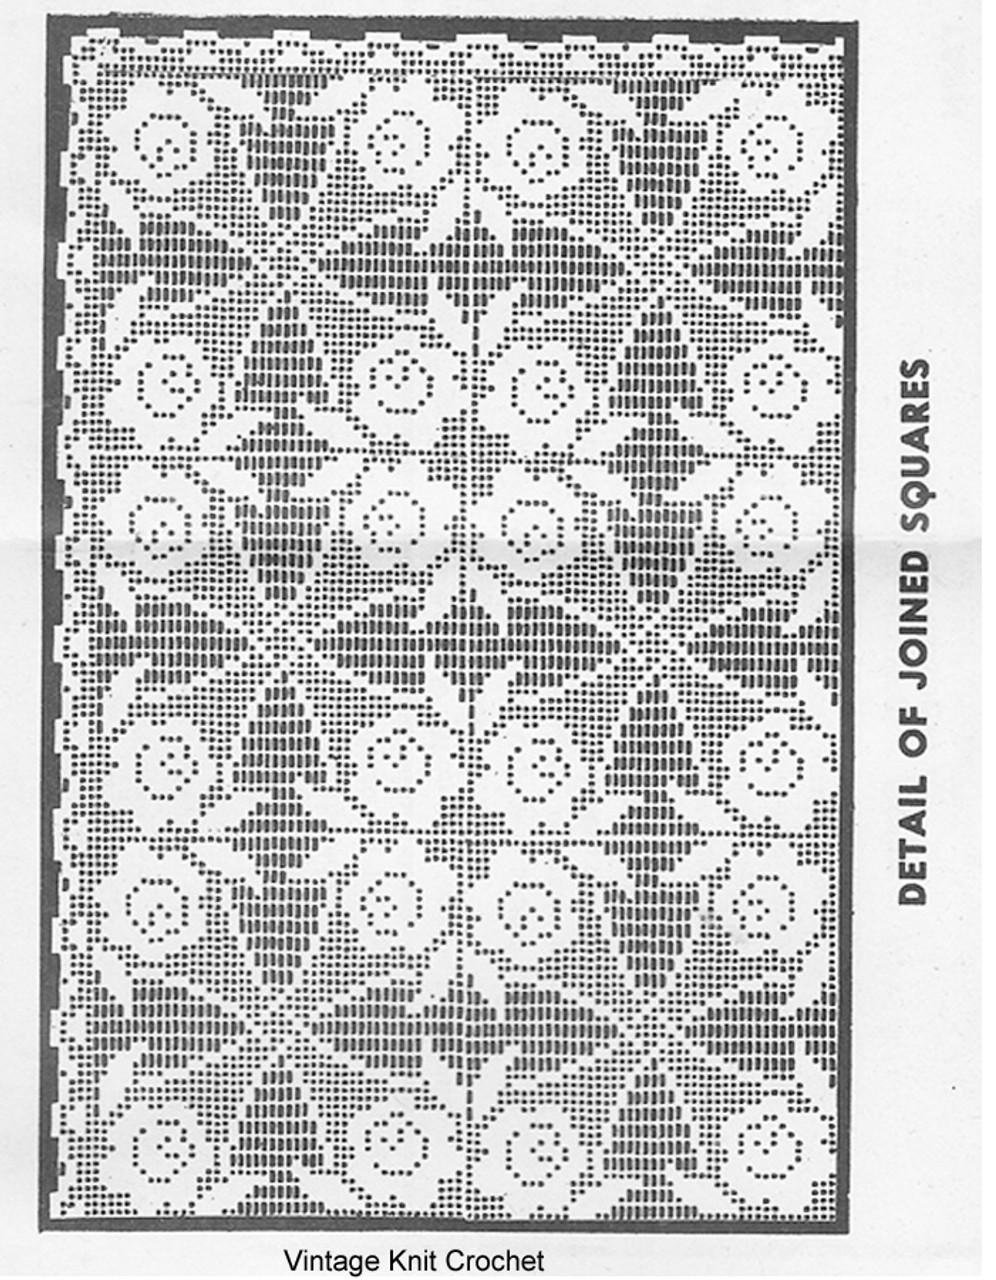 Filet Crochet Rose Tablecloth Pattern, Mail Order 7098